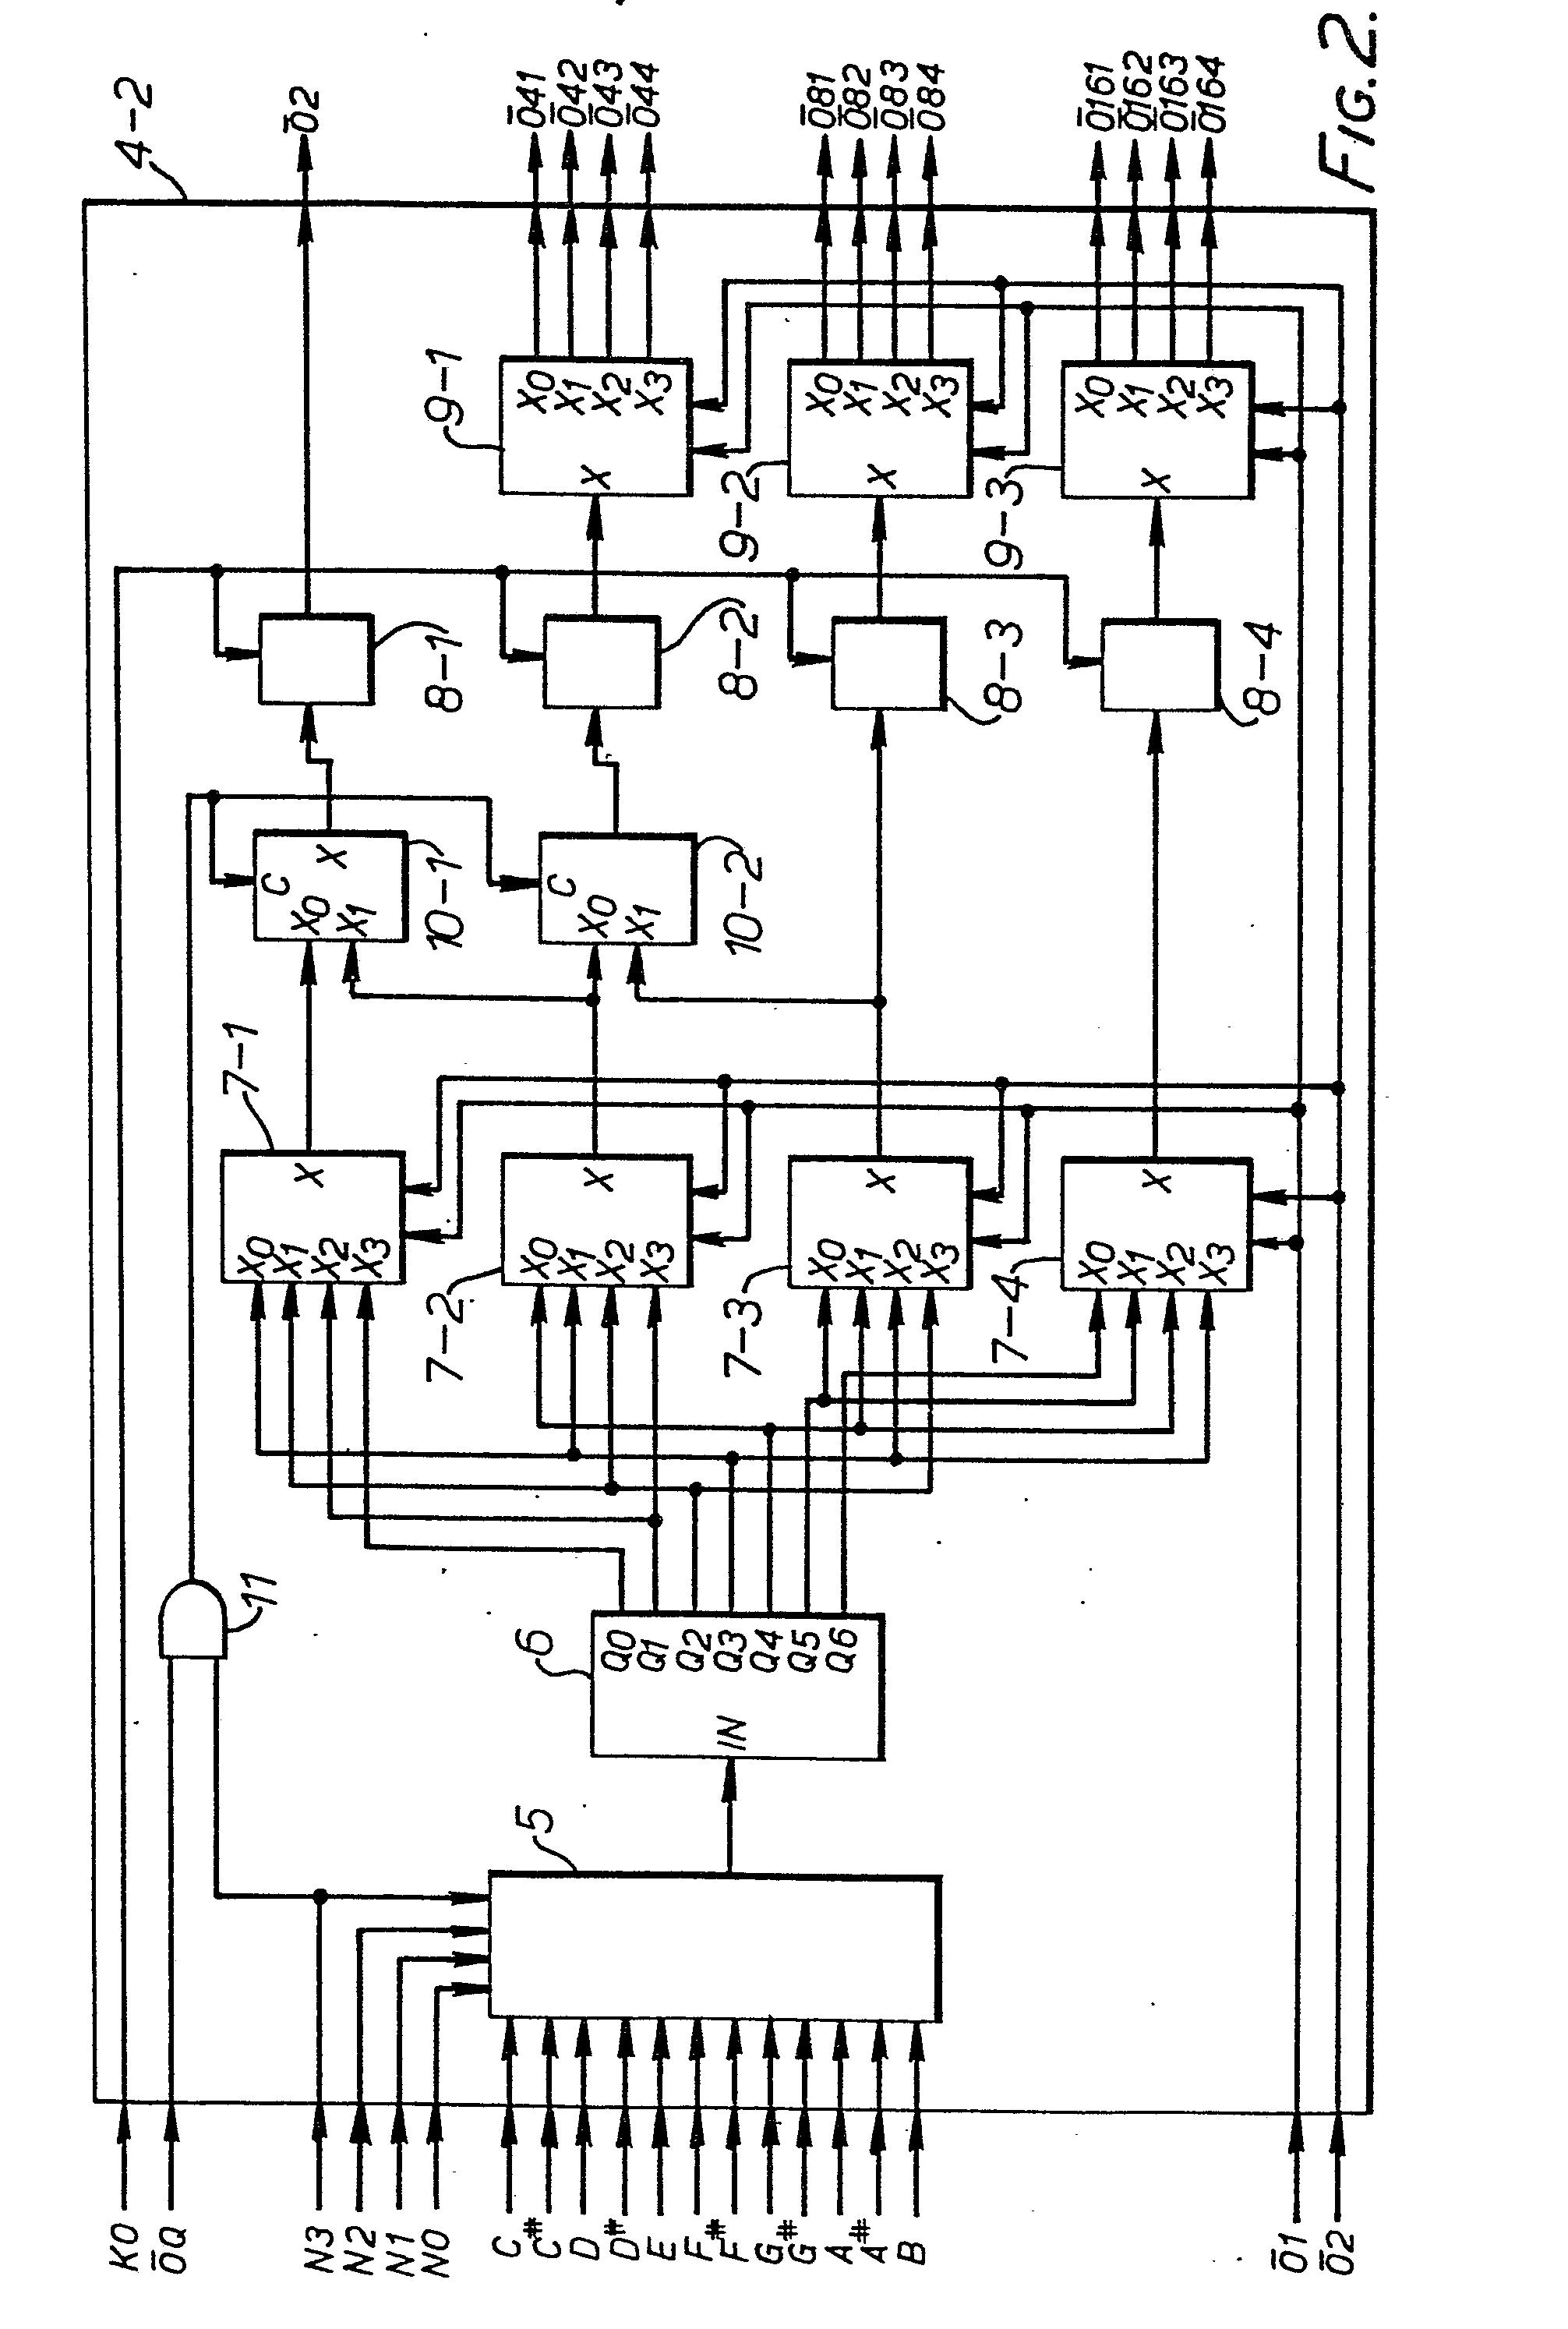 patent ep0038675a2